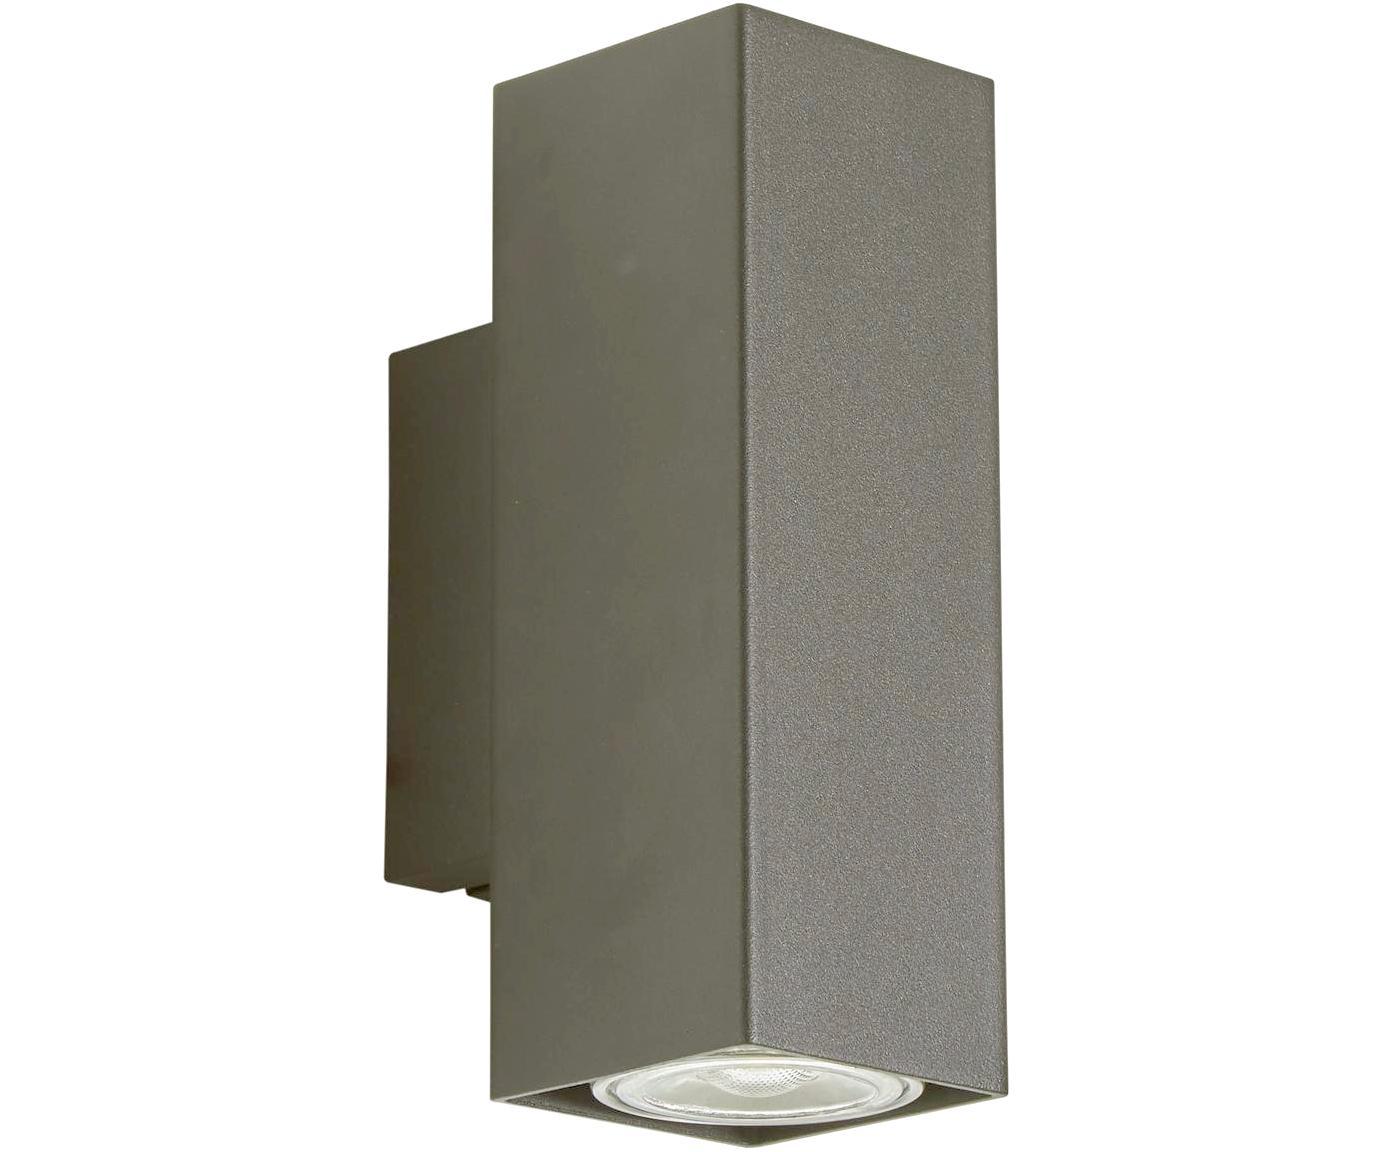 Applique a LED Peter, Metallo cromato, Cromo, Ø 5 x Alt. 8 cm